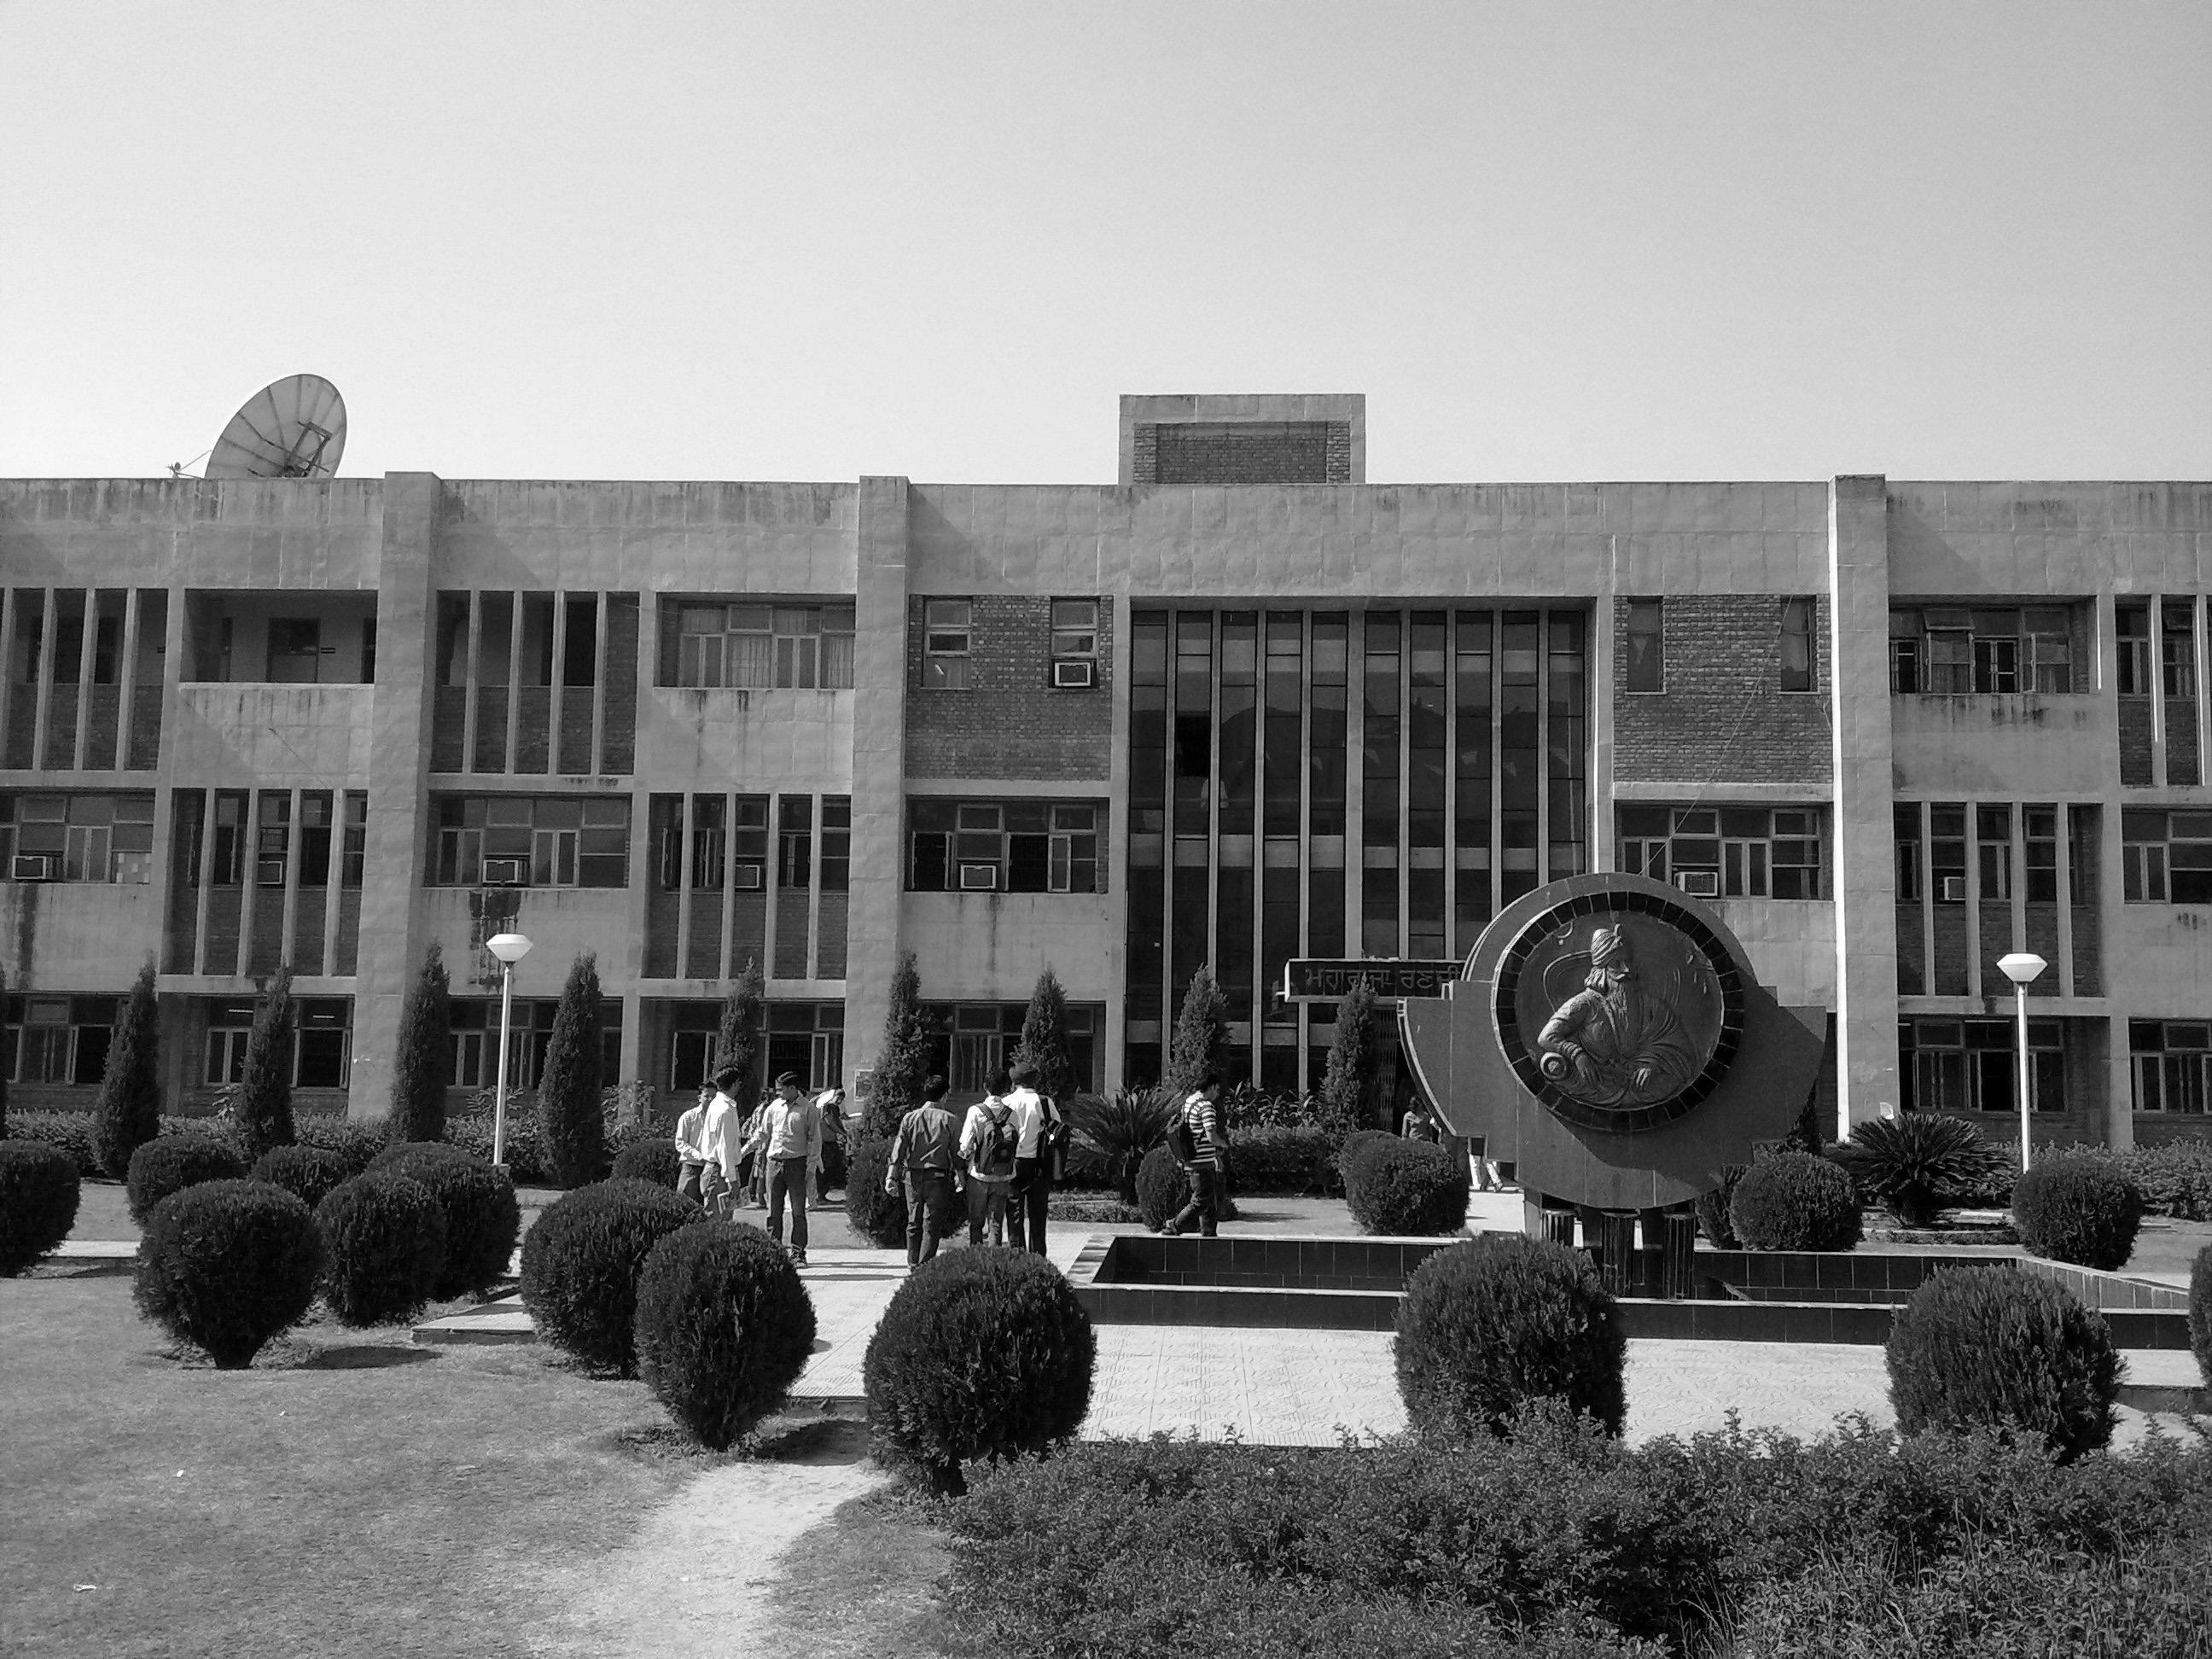 A journey of 100 years of Architecture in India   Part 02 - 1970-85 Guru Nanak Dev University, Amritsar